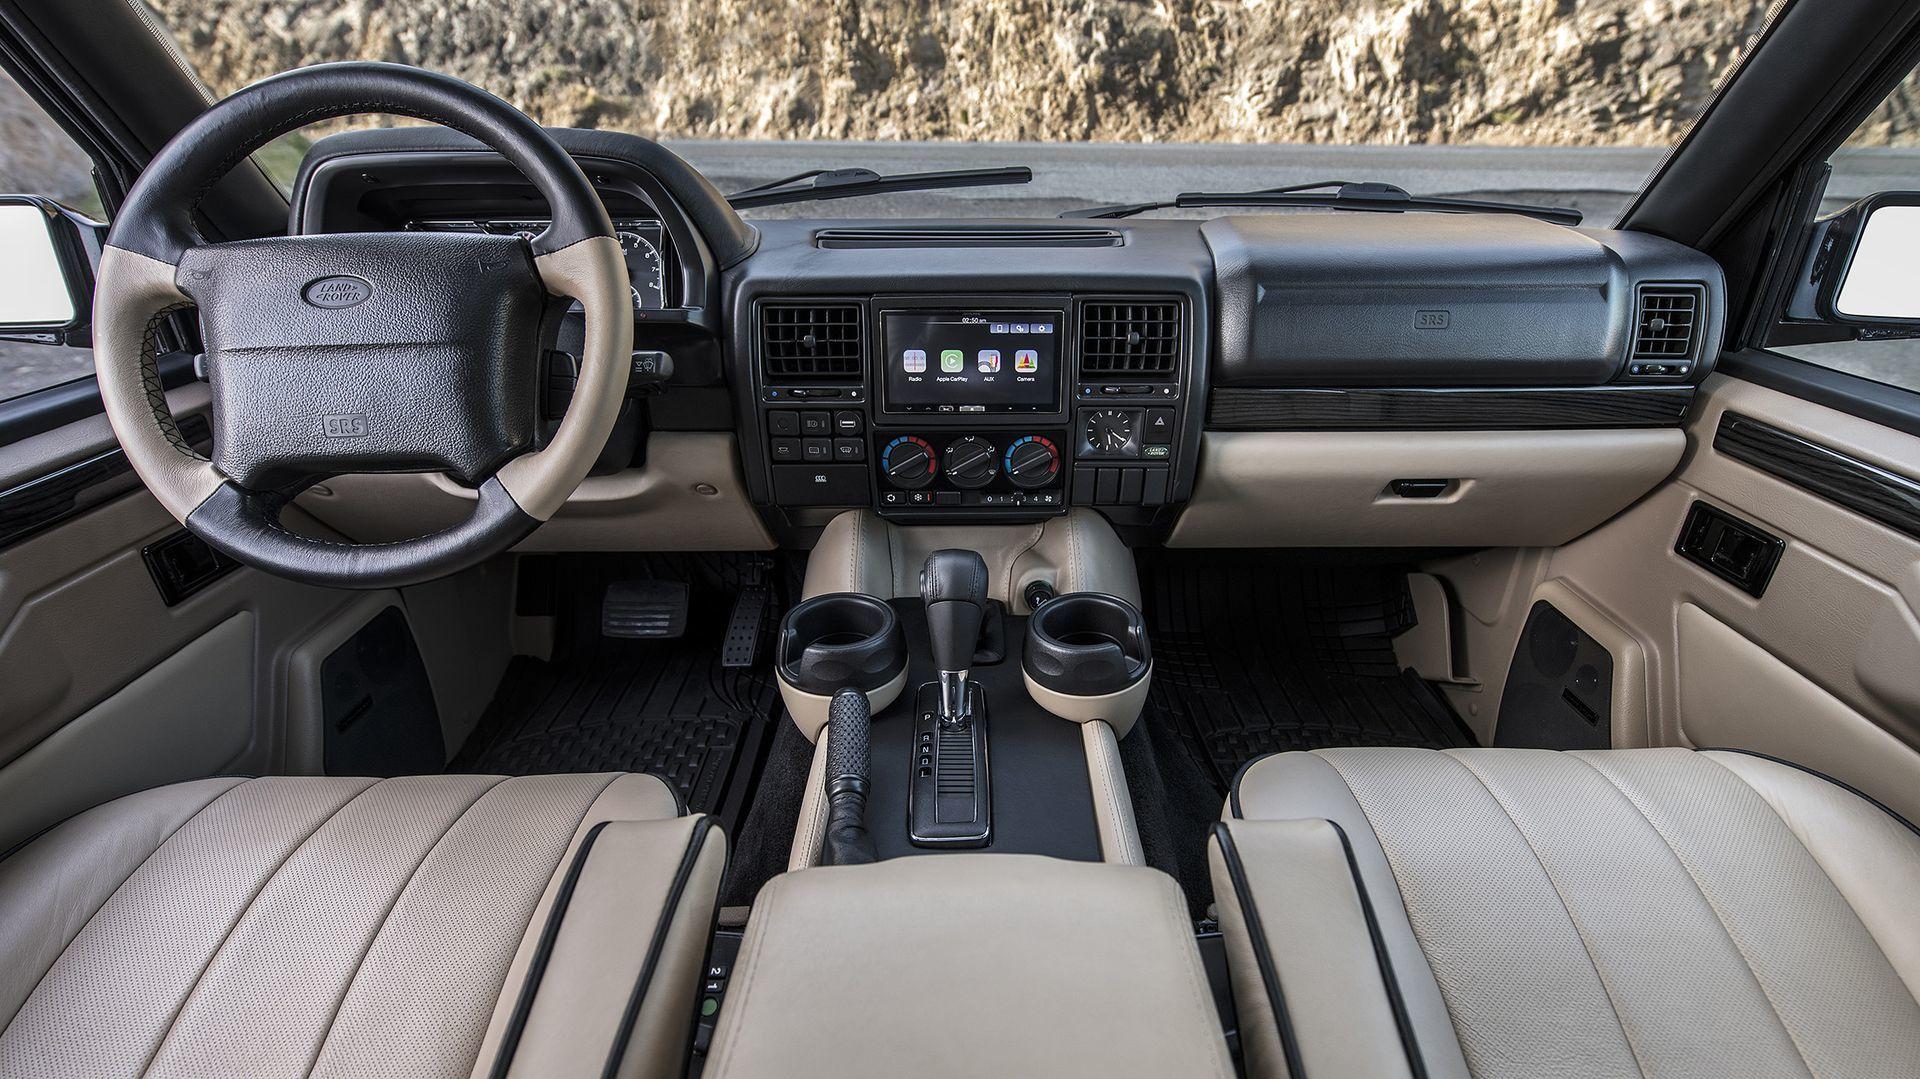 Range Rover Classic Ecd 6